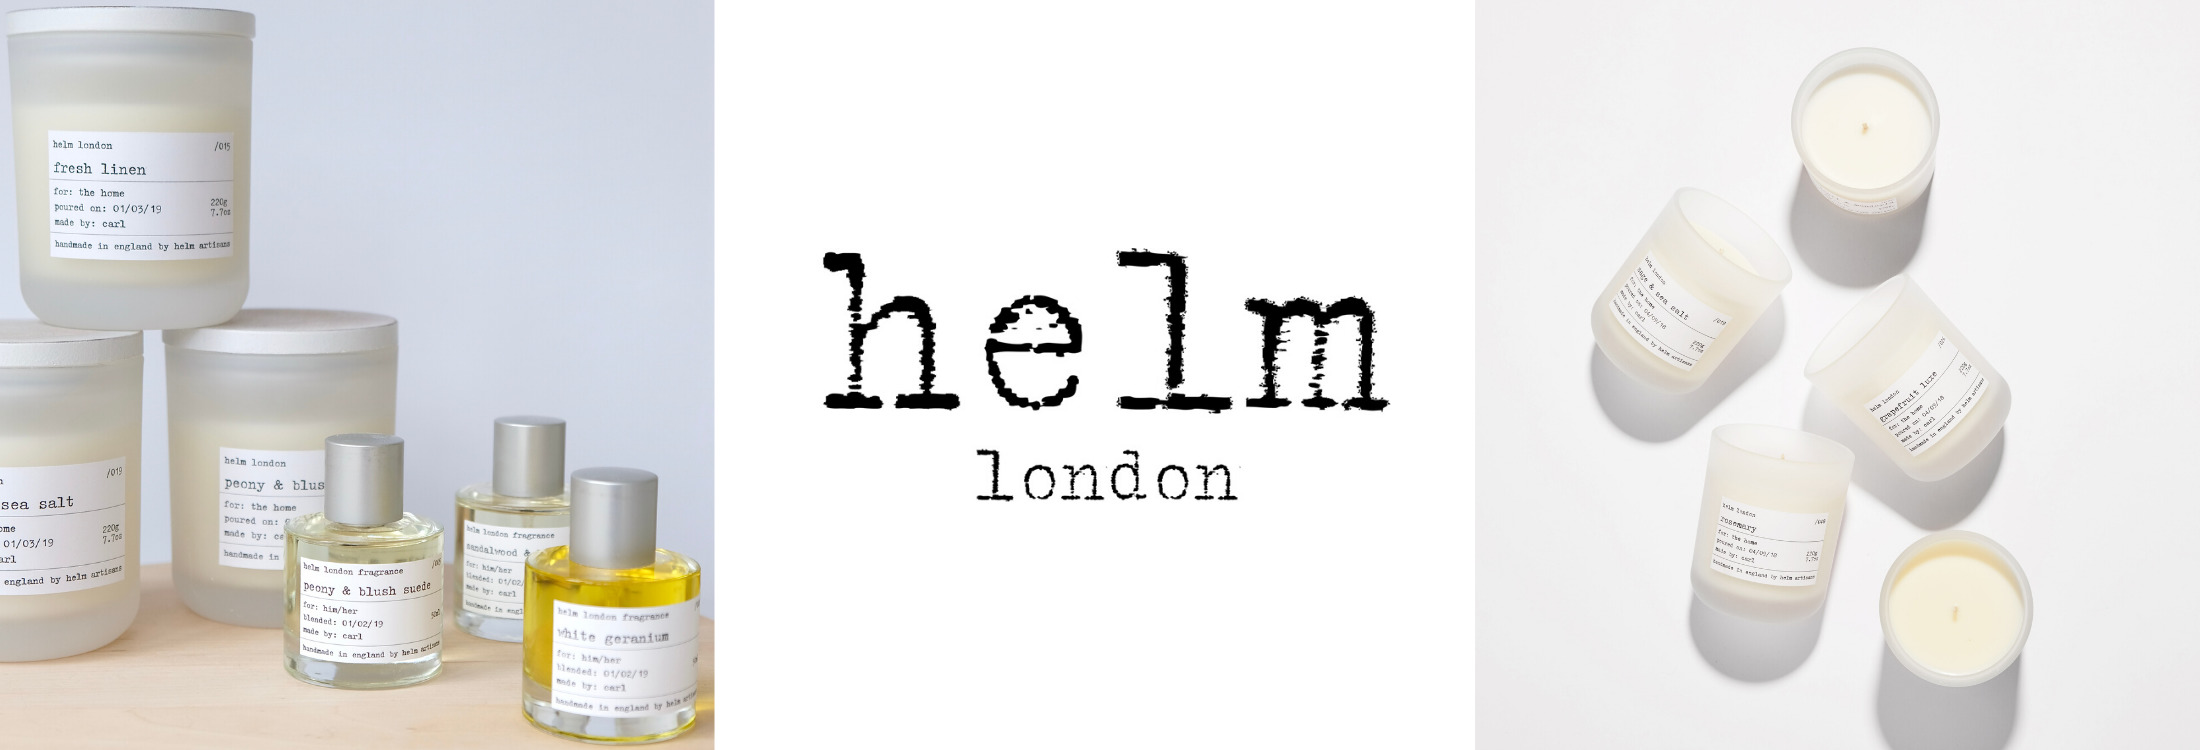 Helm London